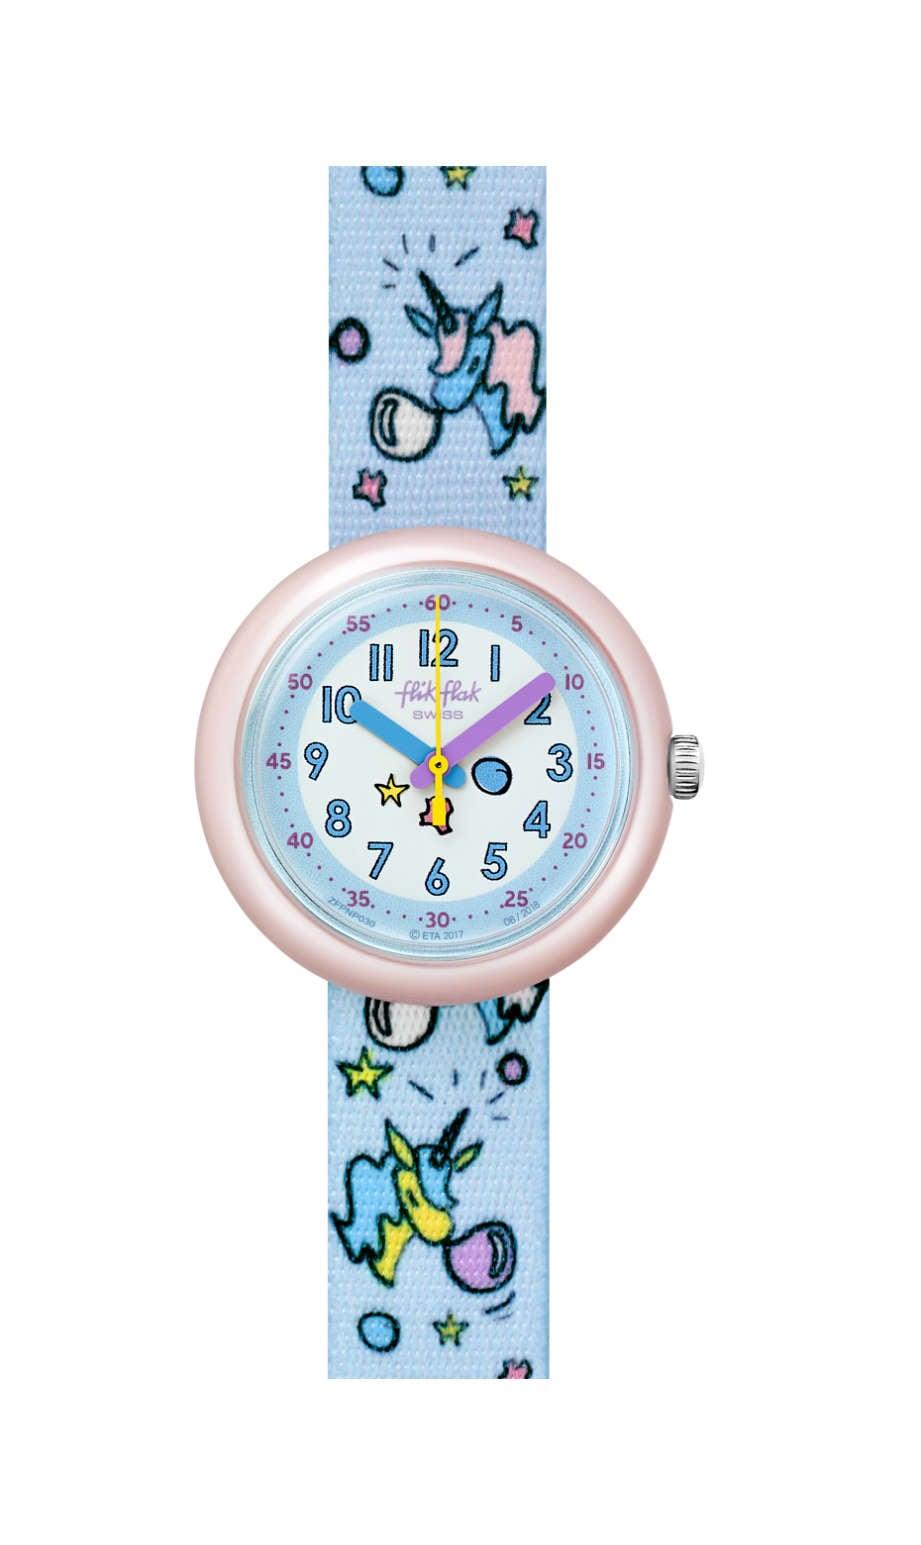 Swatch - BUBBLICORN - 1